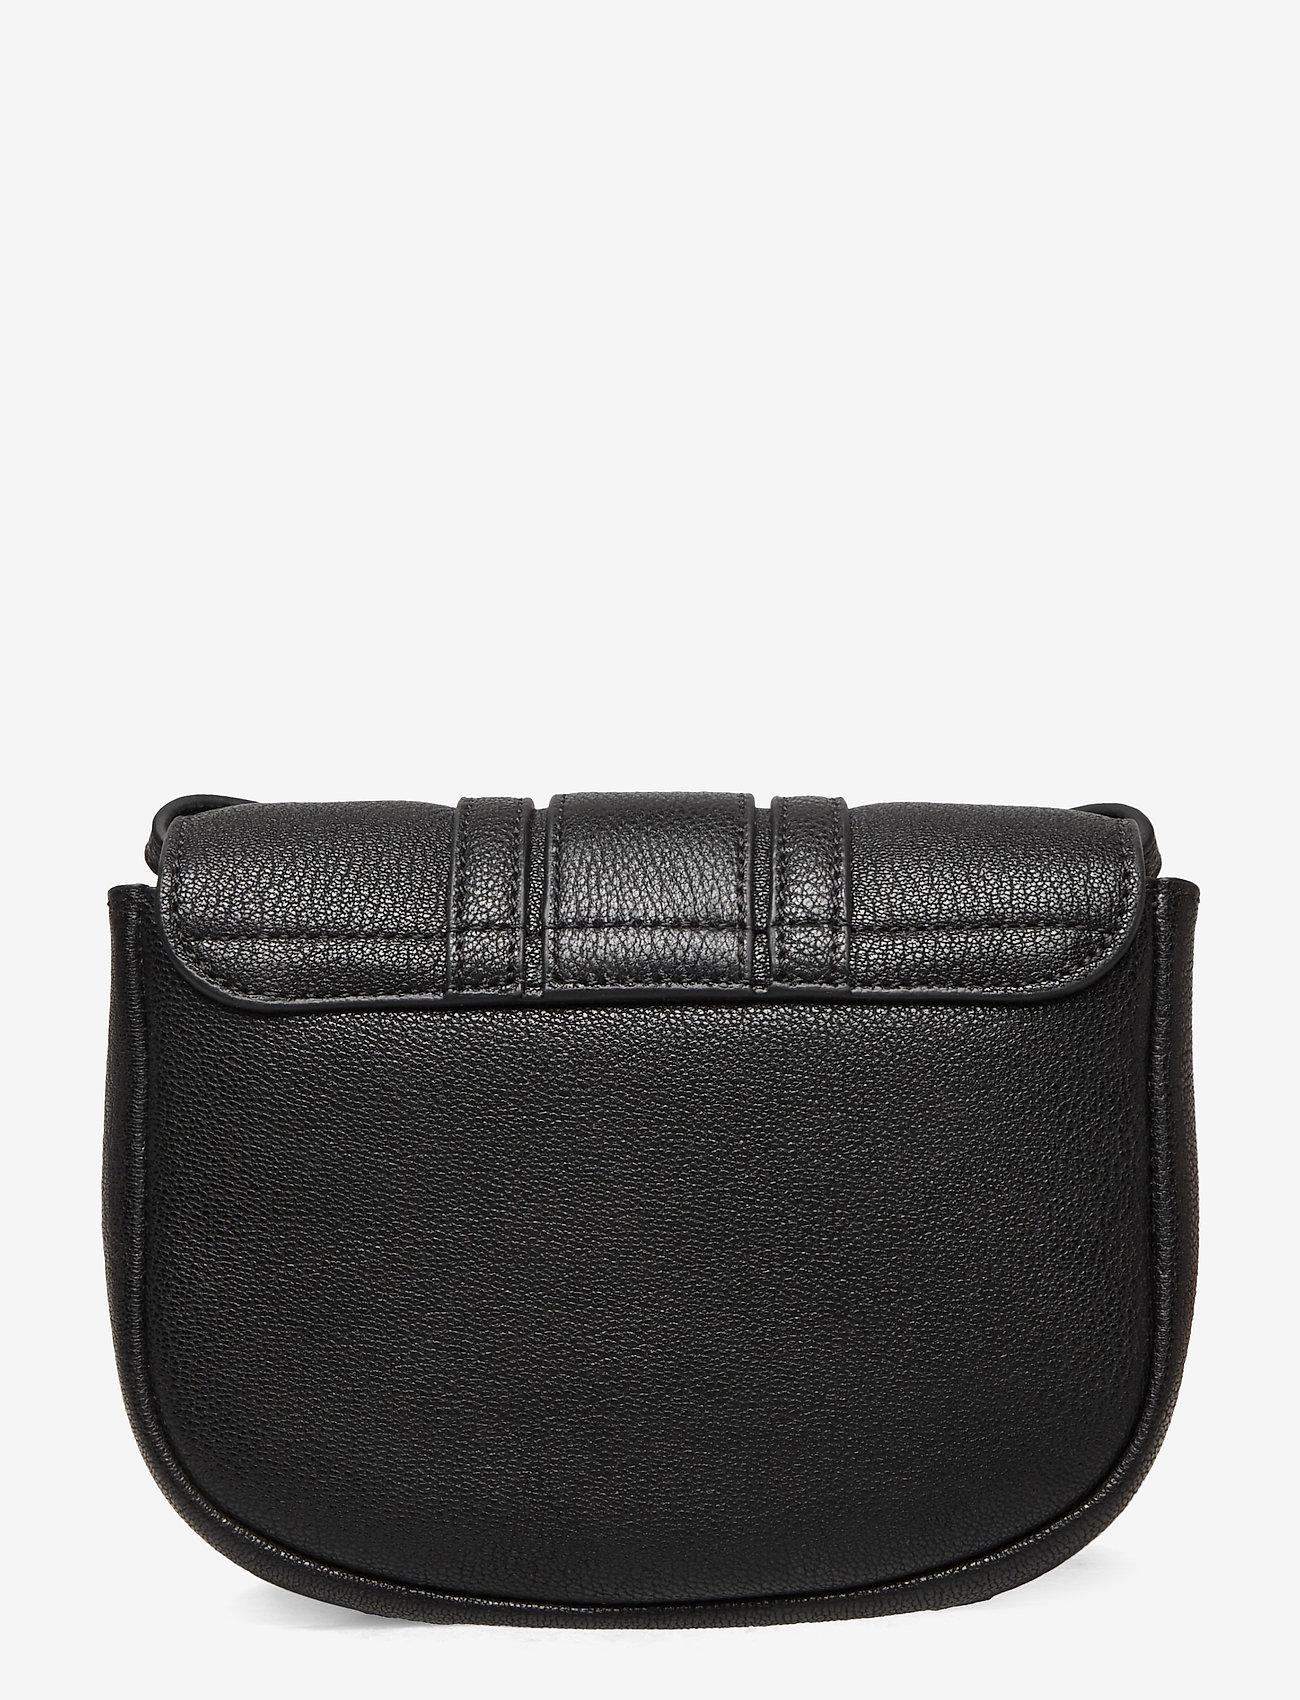 See by Chloé - HANA SBC MINI BAGS - crossbody tassen - black - 1